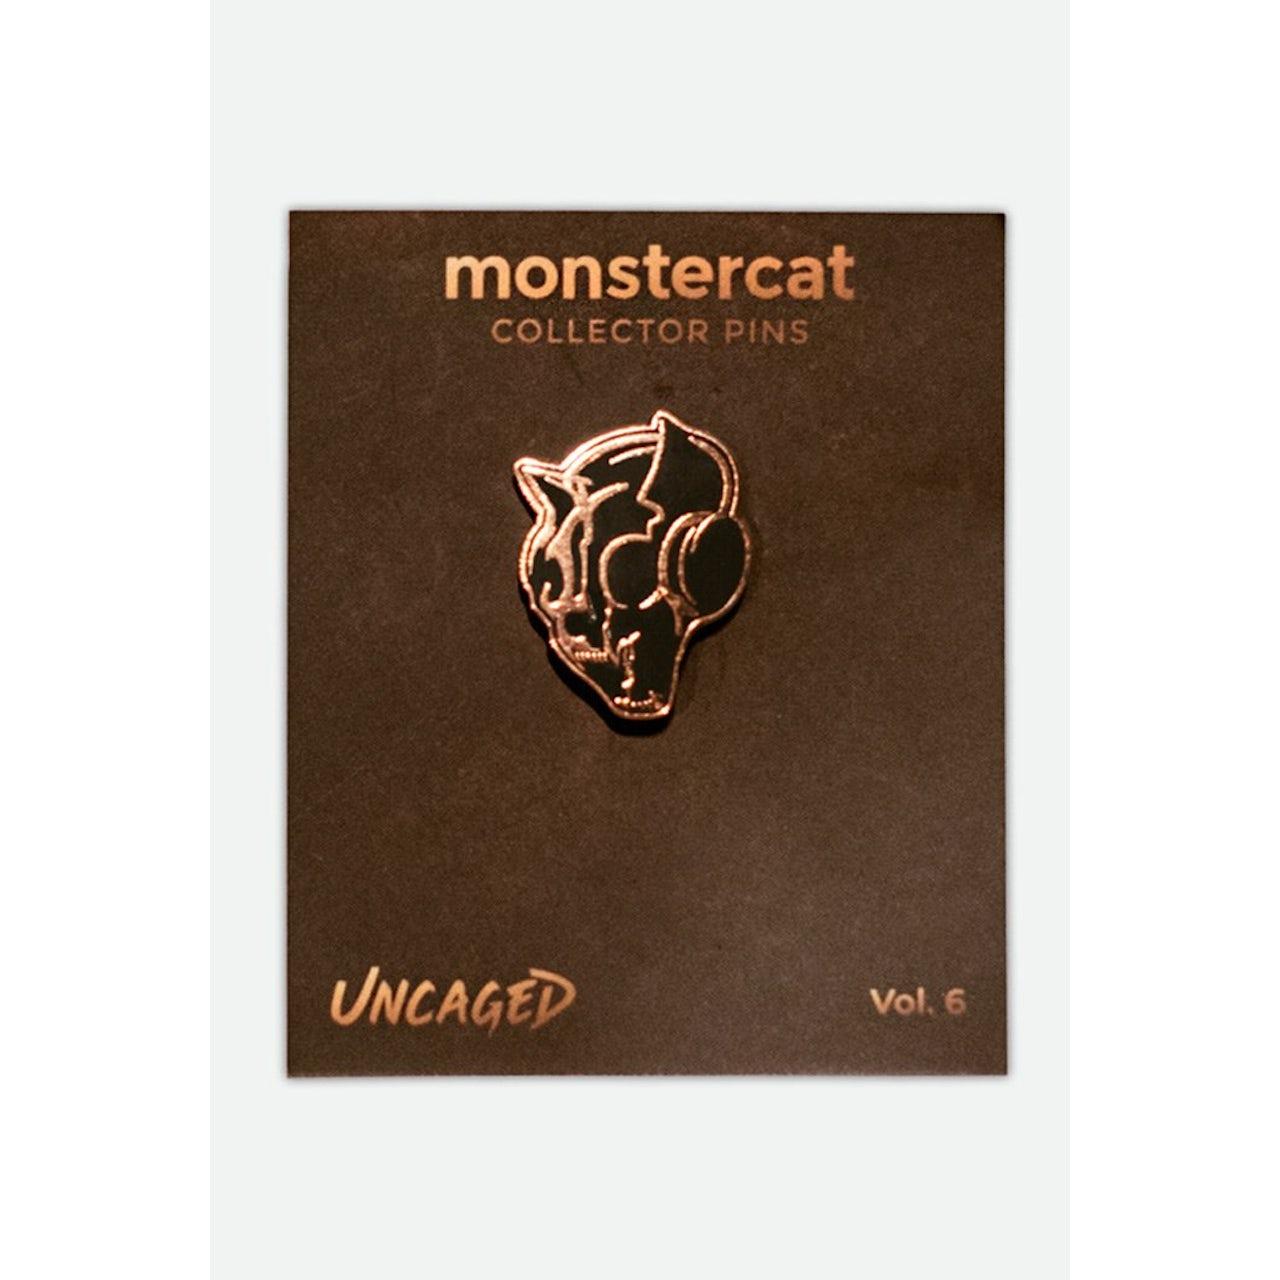 Monstercat Uncaged Vol  6 Enamel Pin